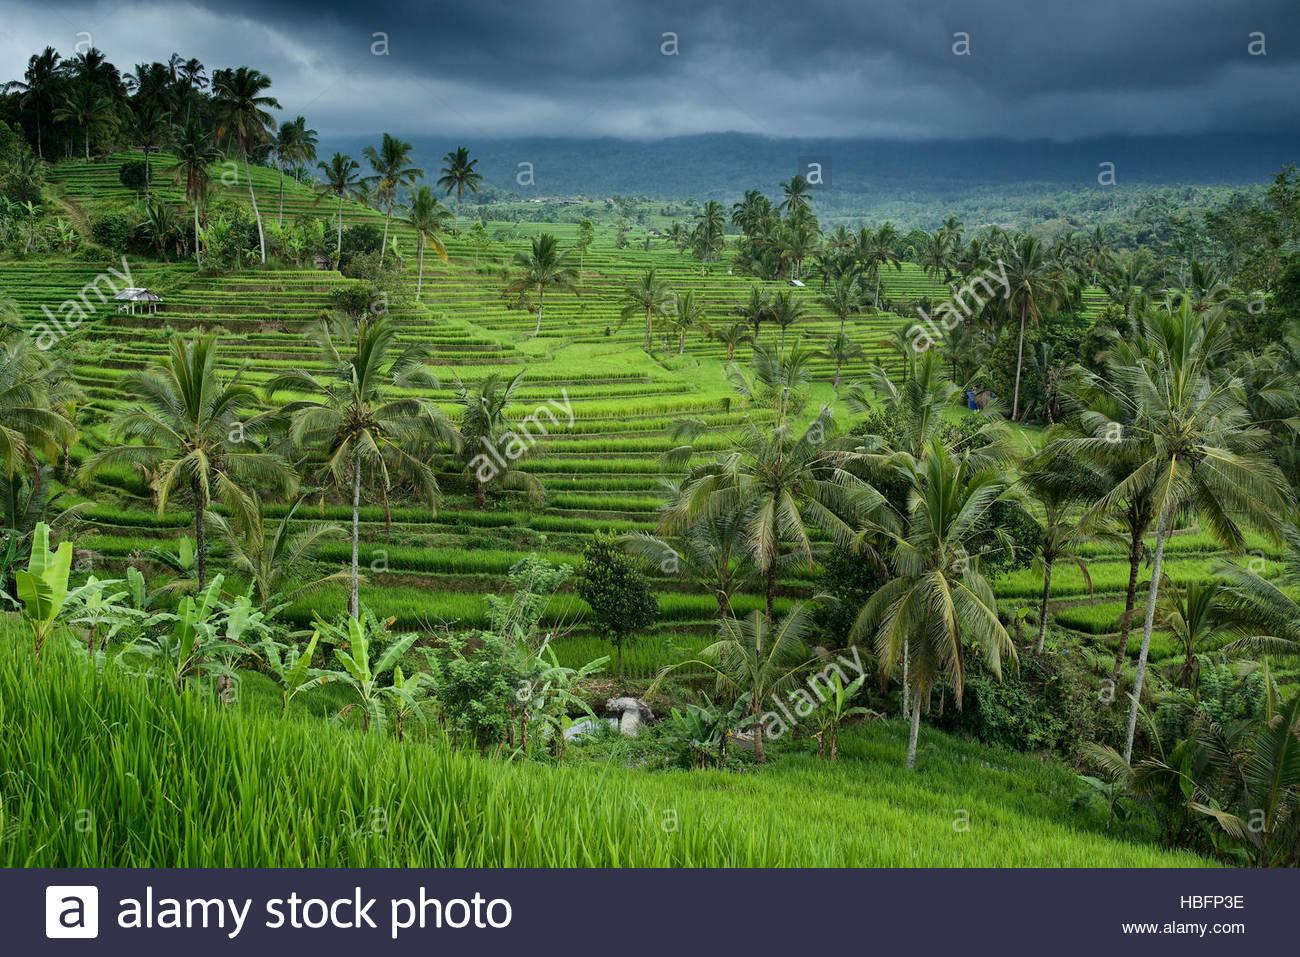 The Jatiluwih Rice Terraces. - Stock Image